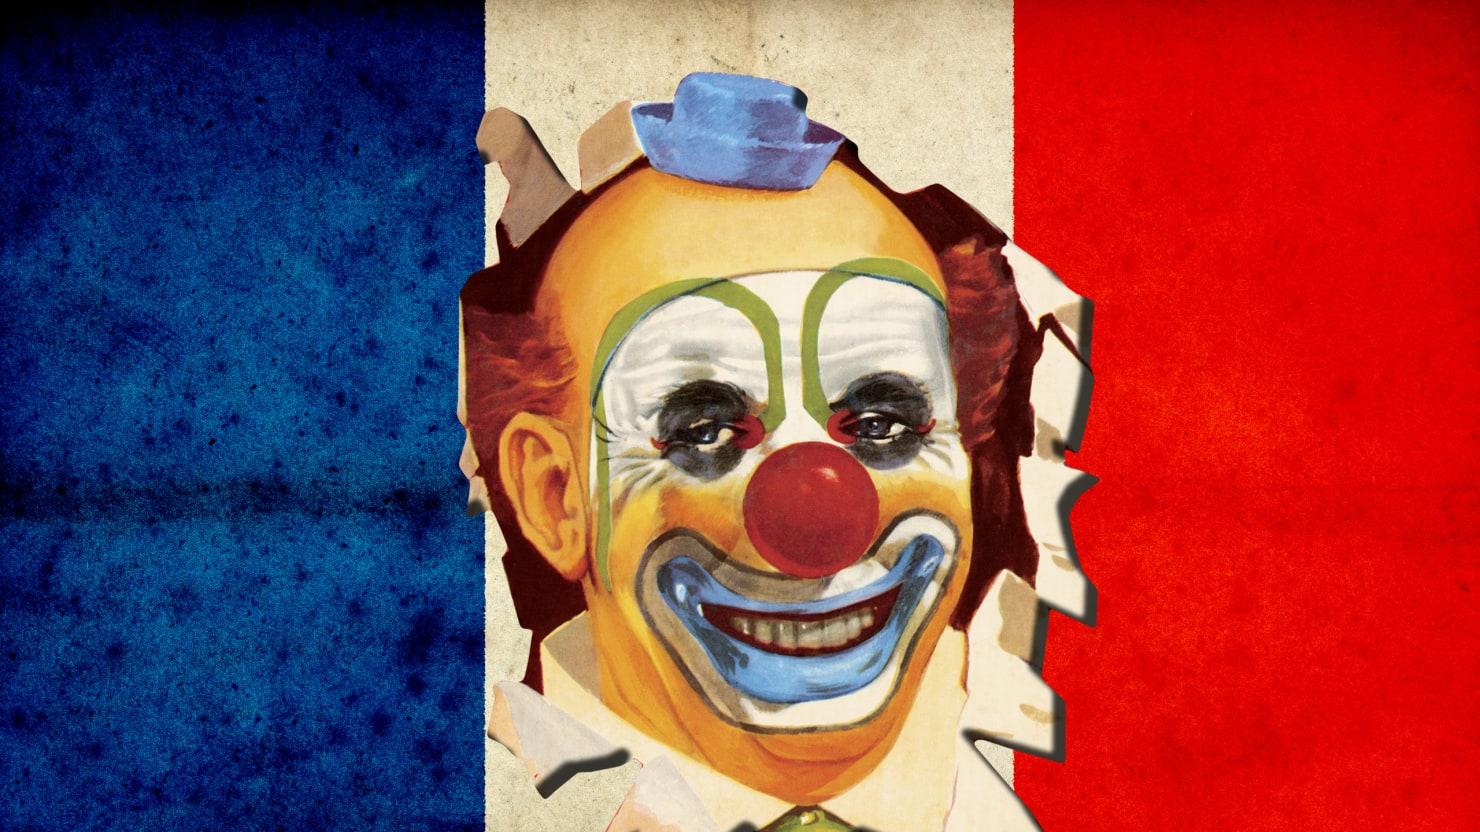 Od suze do osmeha... - Page 4 141031-mcnicoll-clowns-tease_uturij